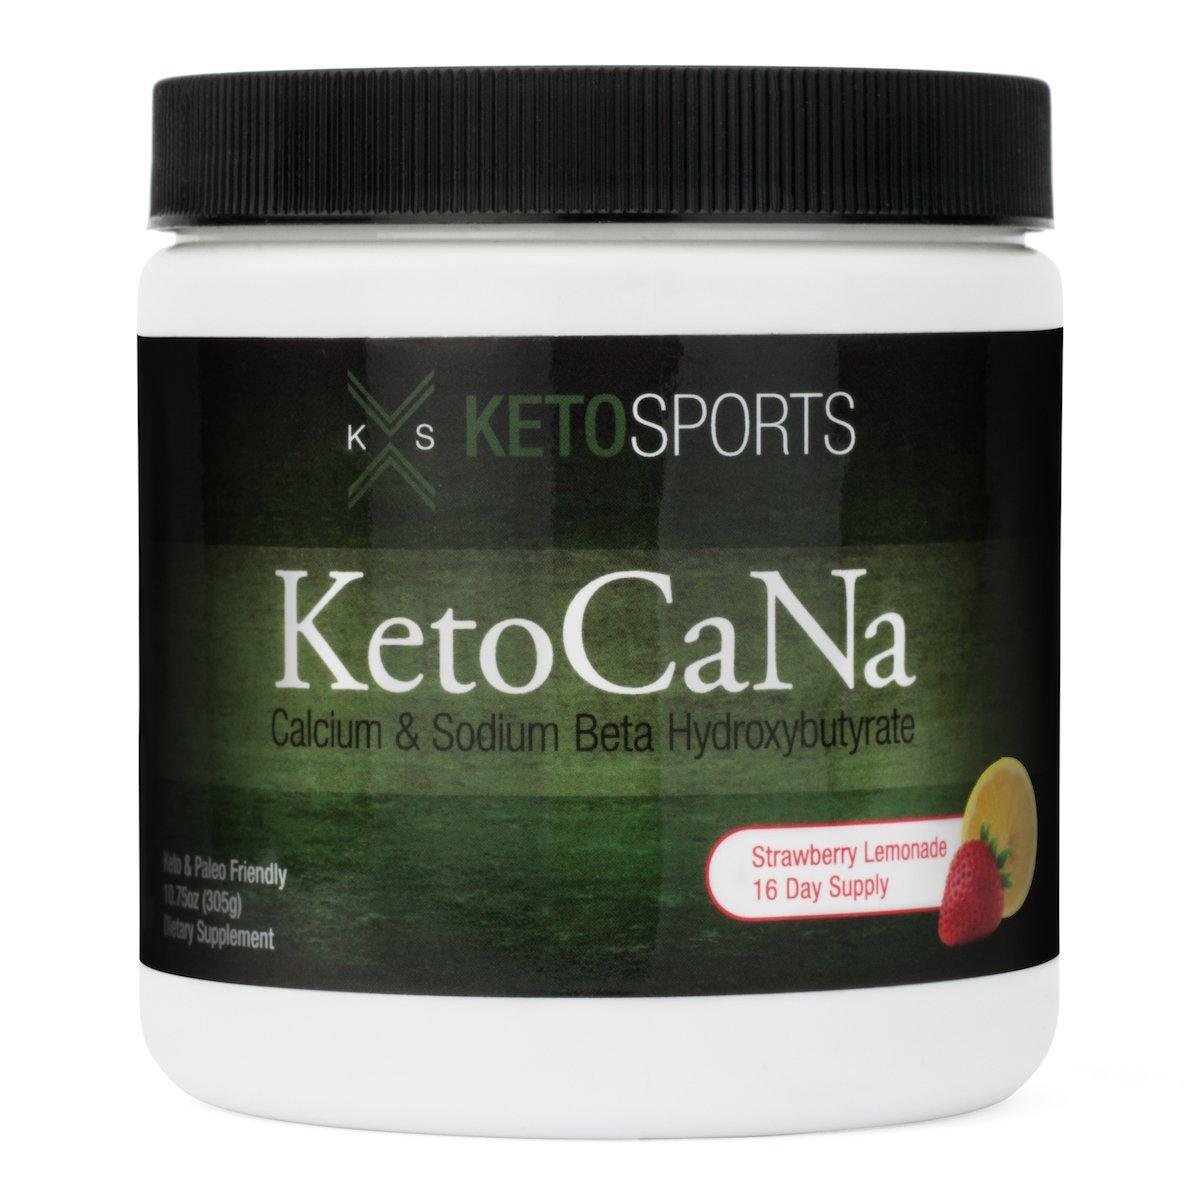 KetoSports KetoCaNa Dietary Supplement, Strawberry Lemonade, 305g by KetoSports